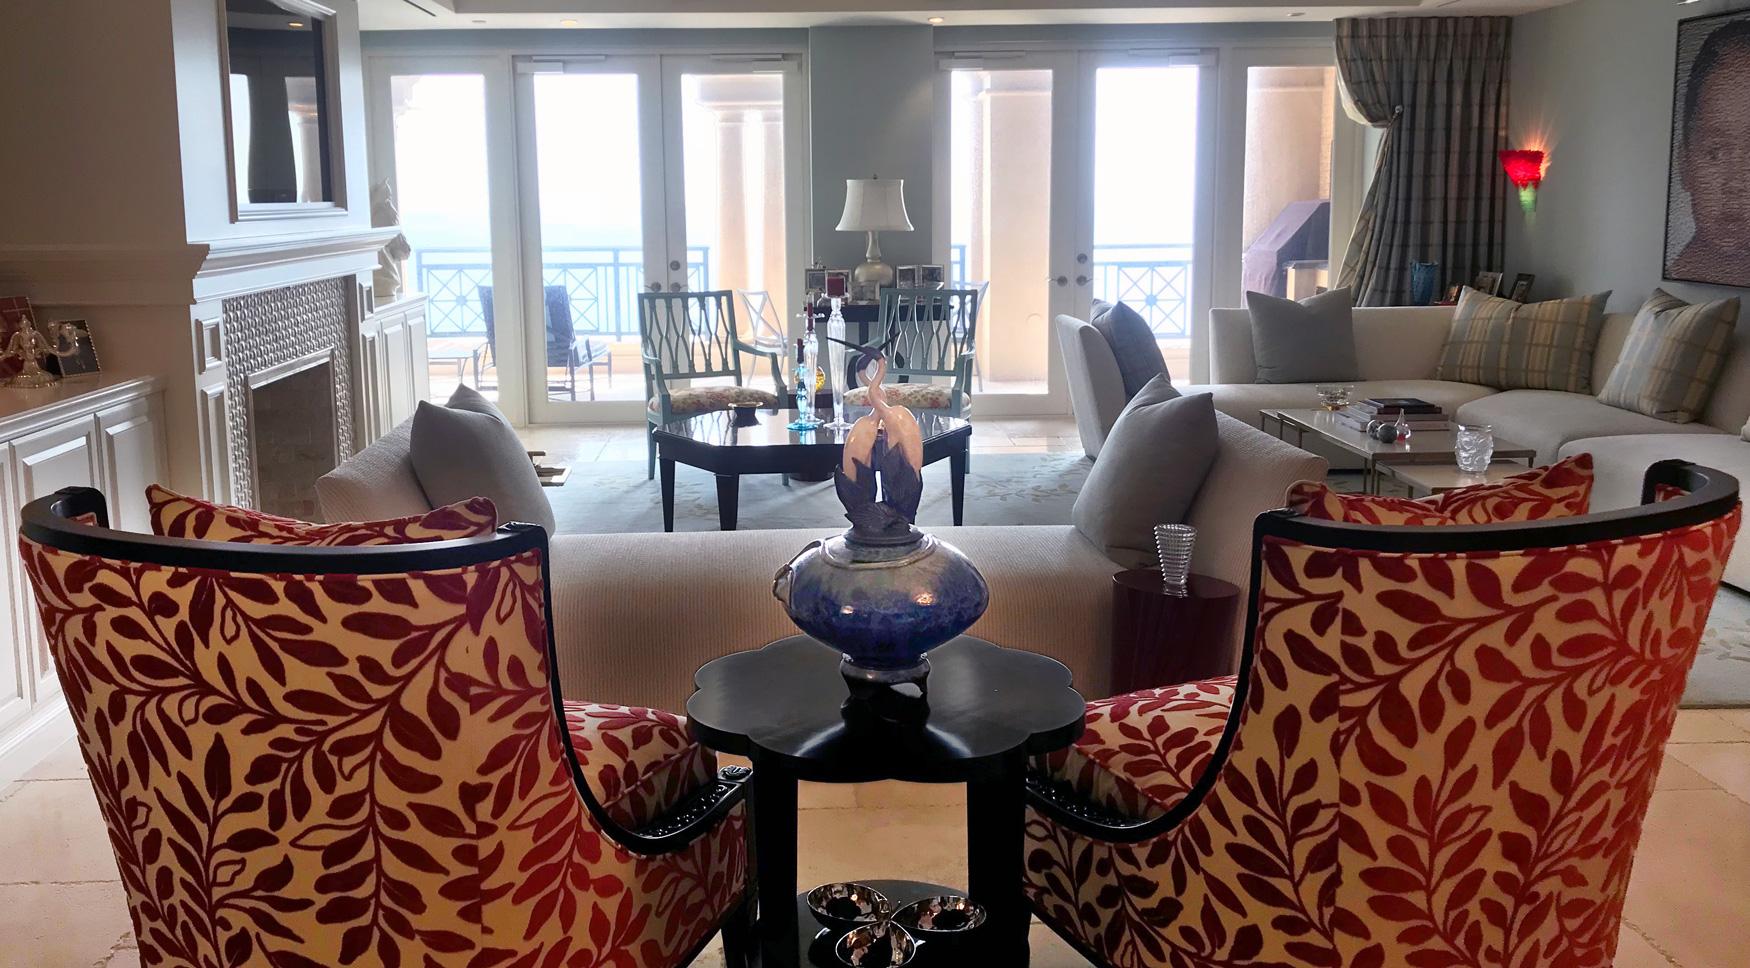 Debra Steidel's luxury interior designer